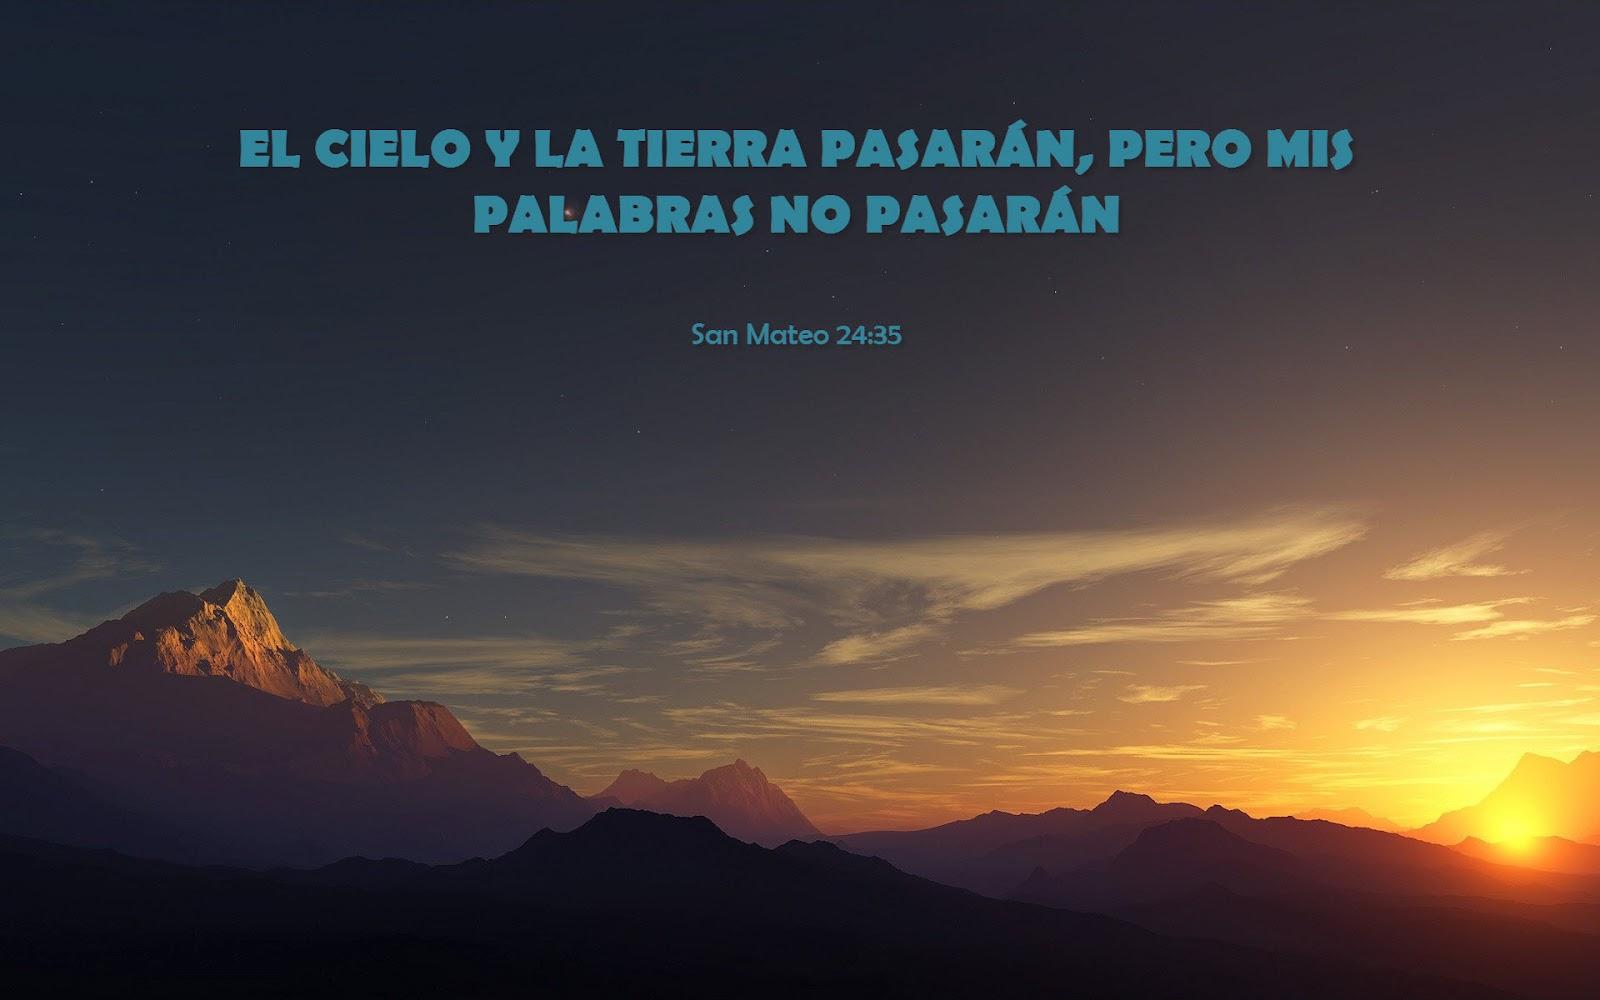 wallpaper cristianos - photo #21